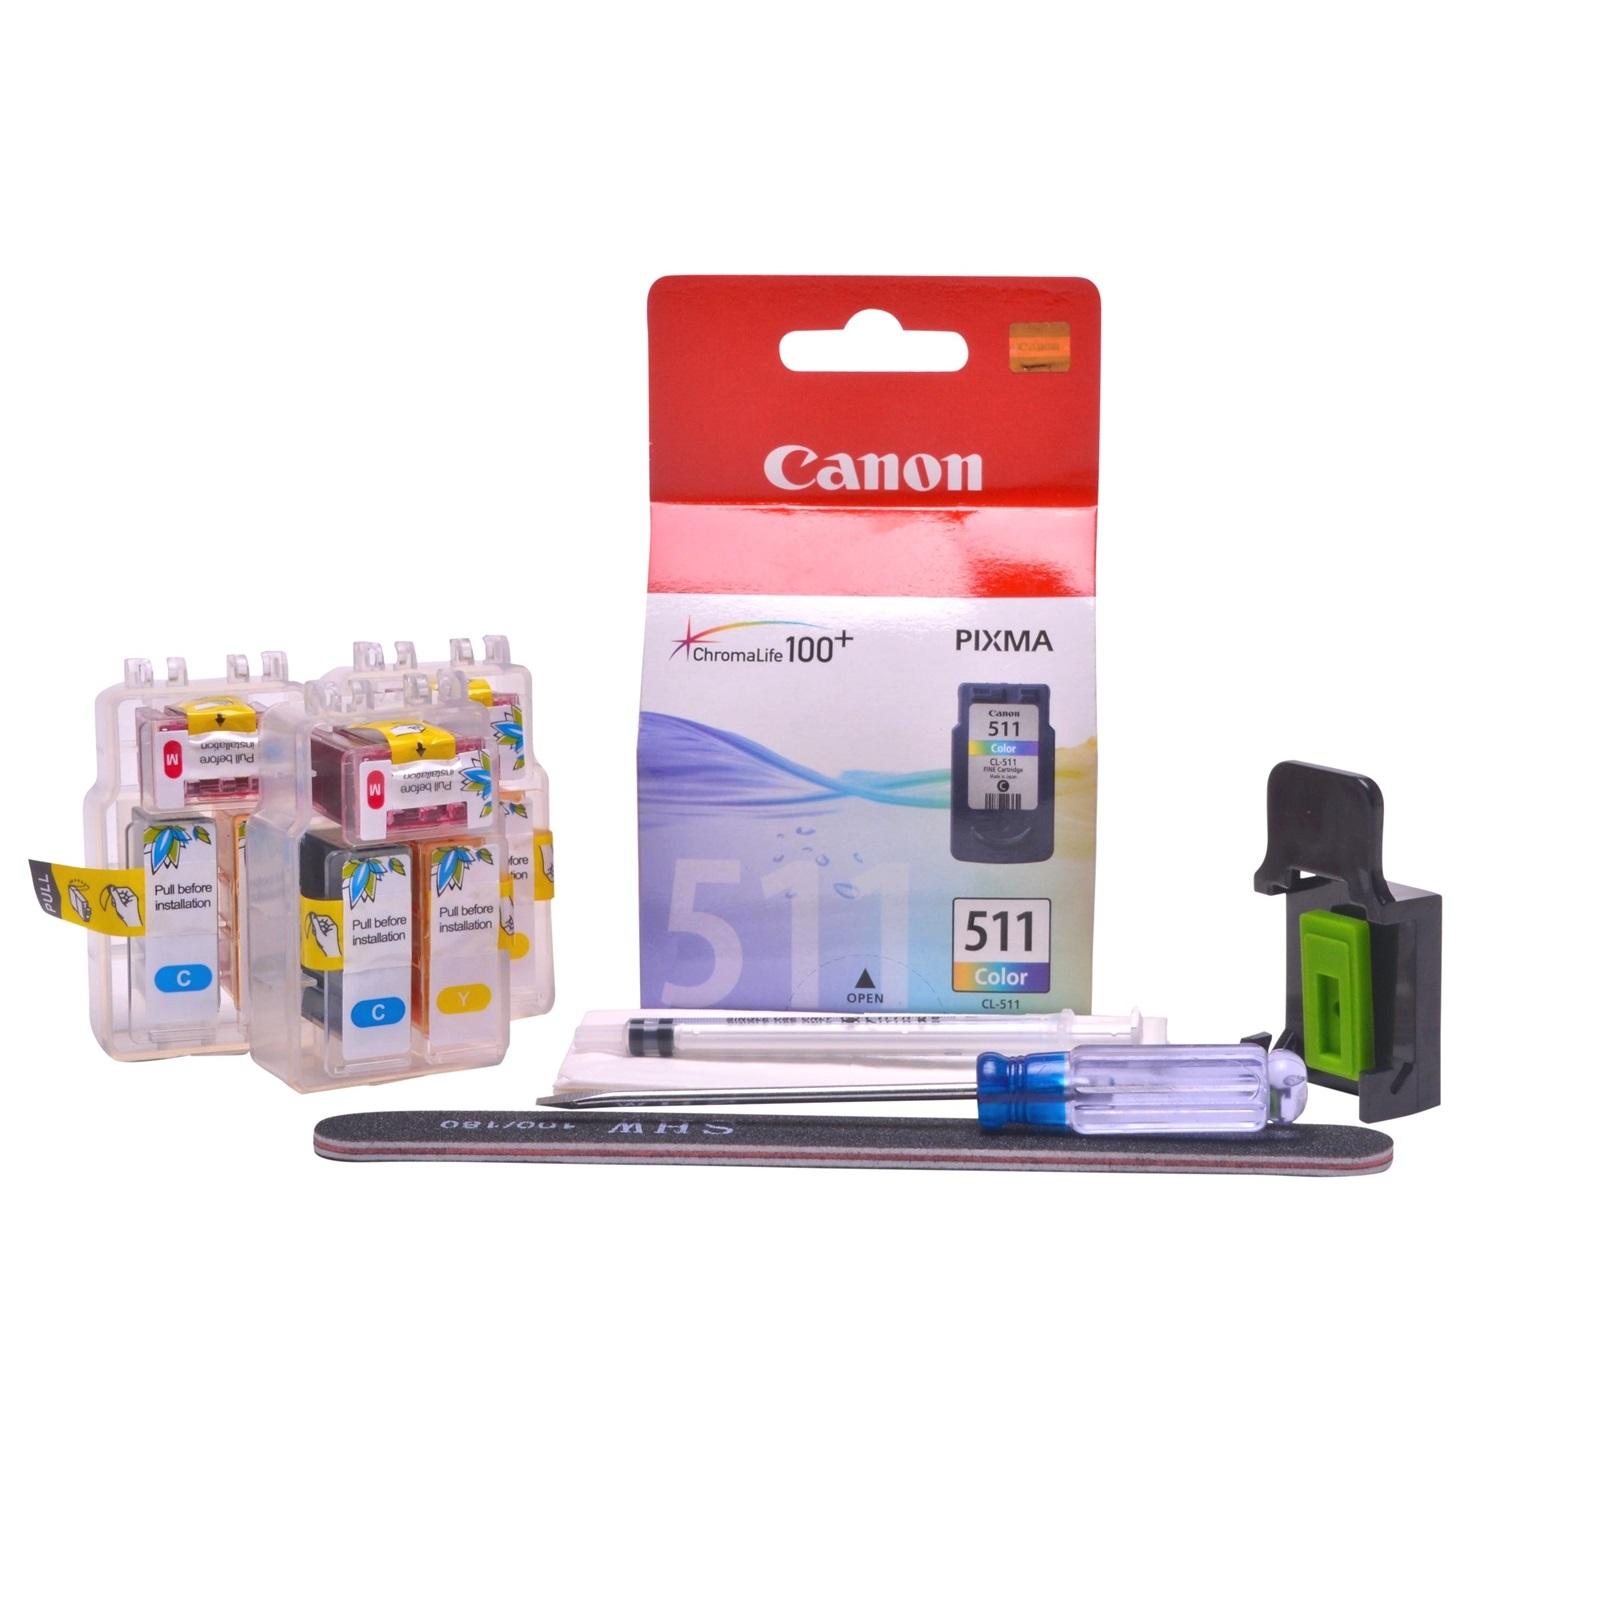 Refillable CL-513 Colour Pod Cheap printer cartridges for Canon Pixma MX420 CL-511 dye ink